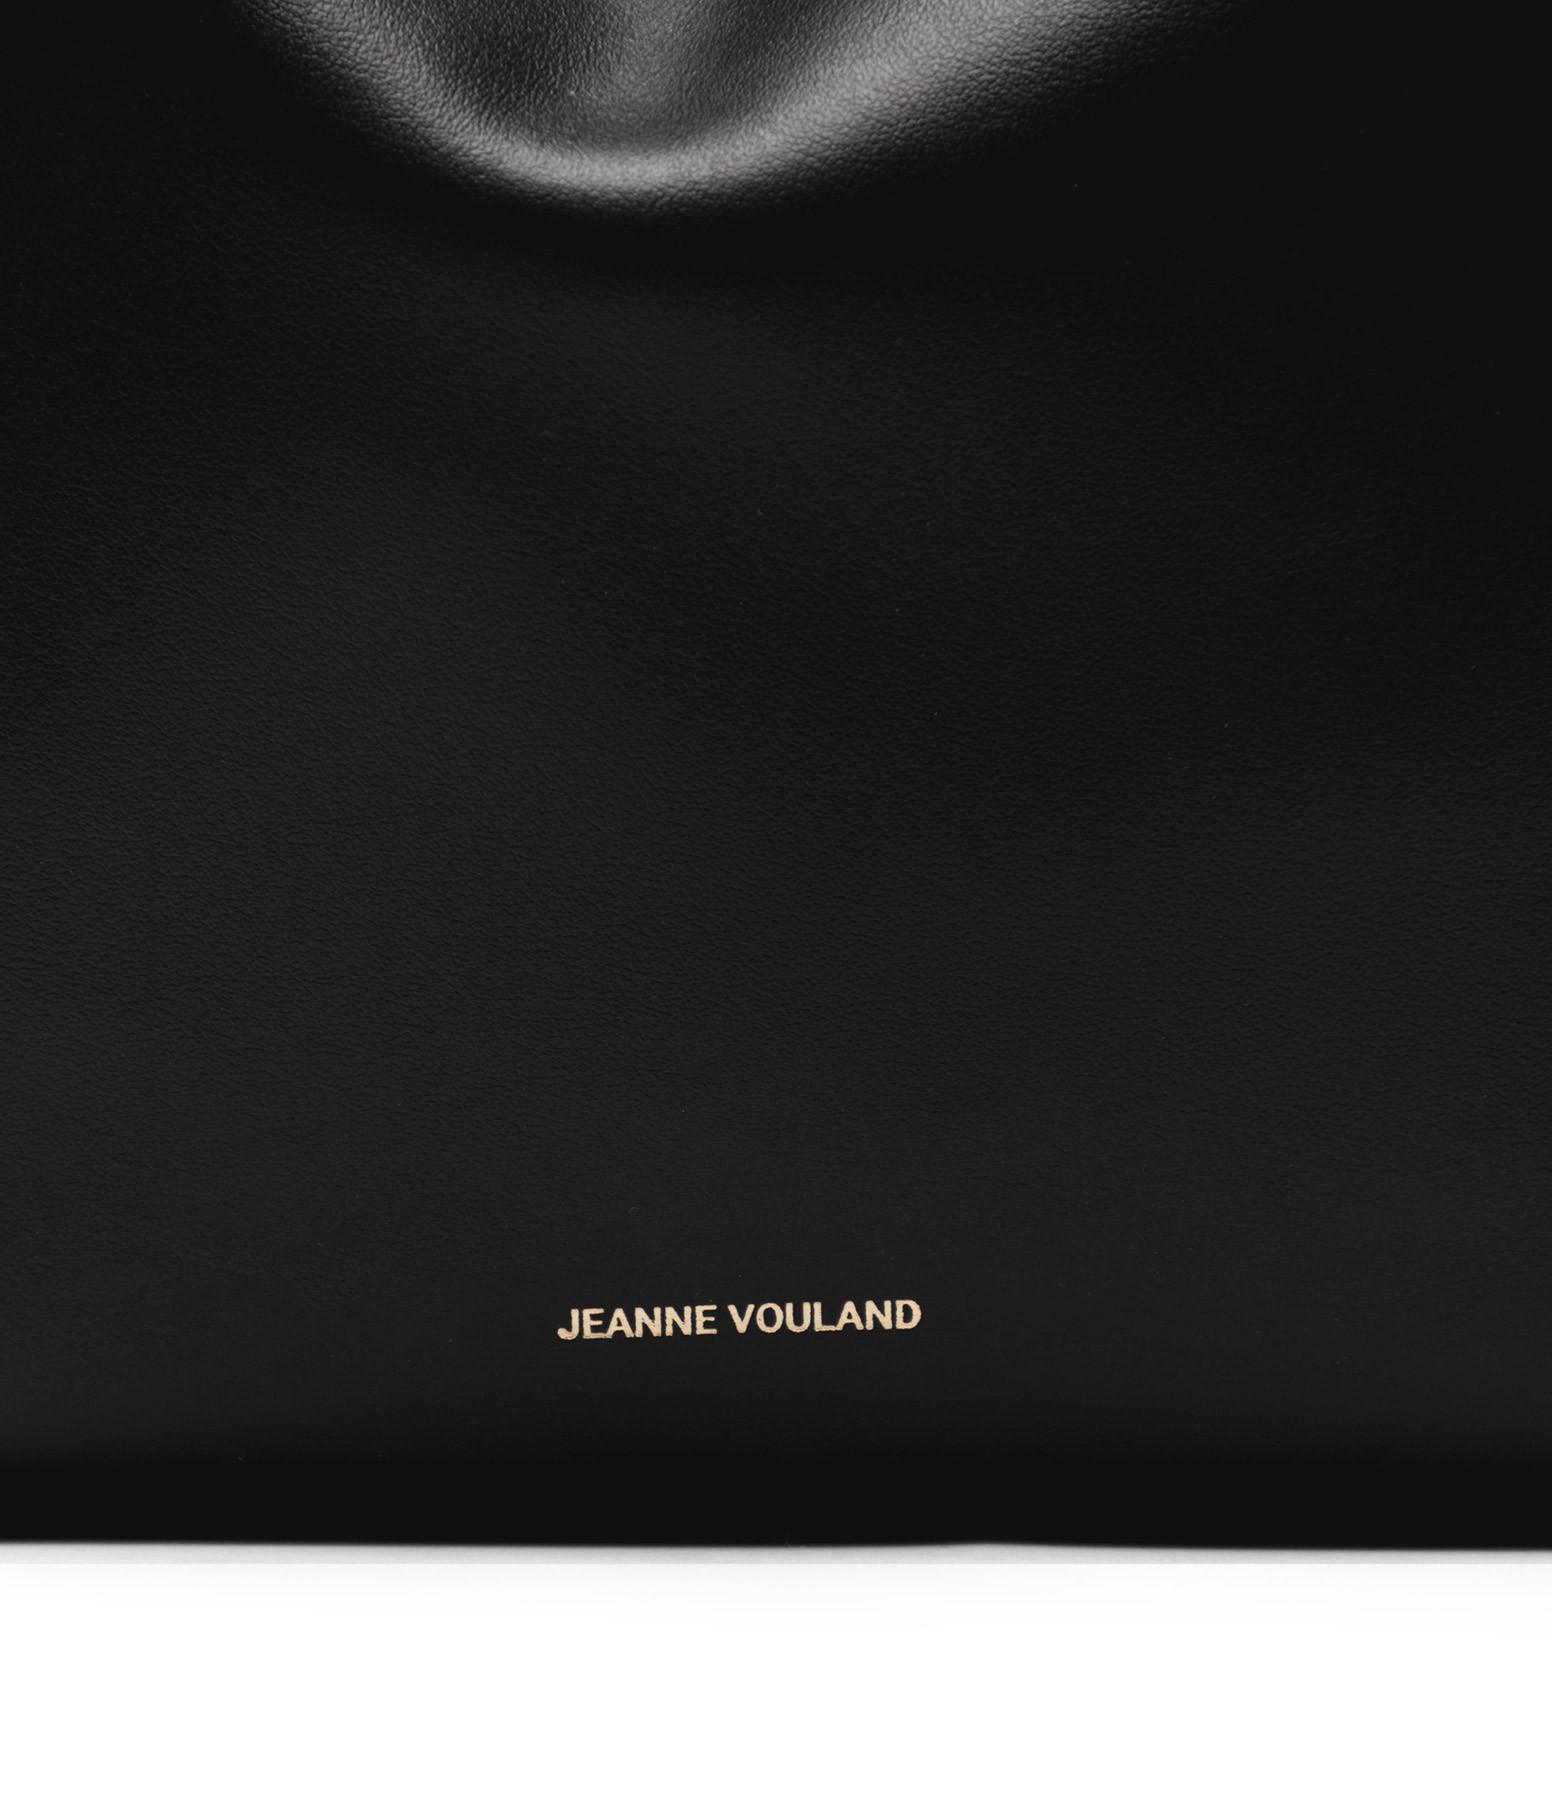 JEANNE VOULAND - Sac Seau San Cuir Lisse Noir